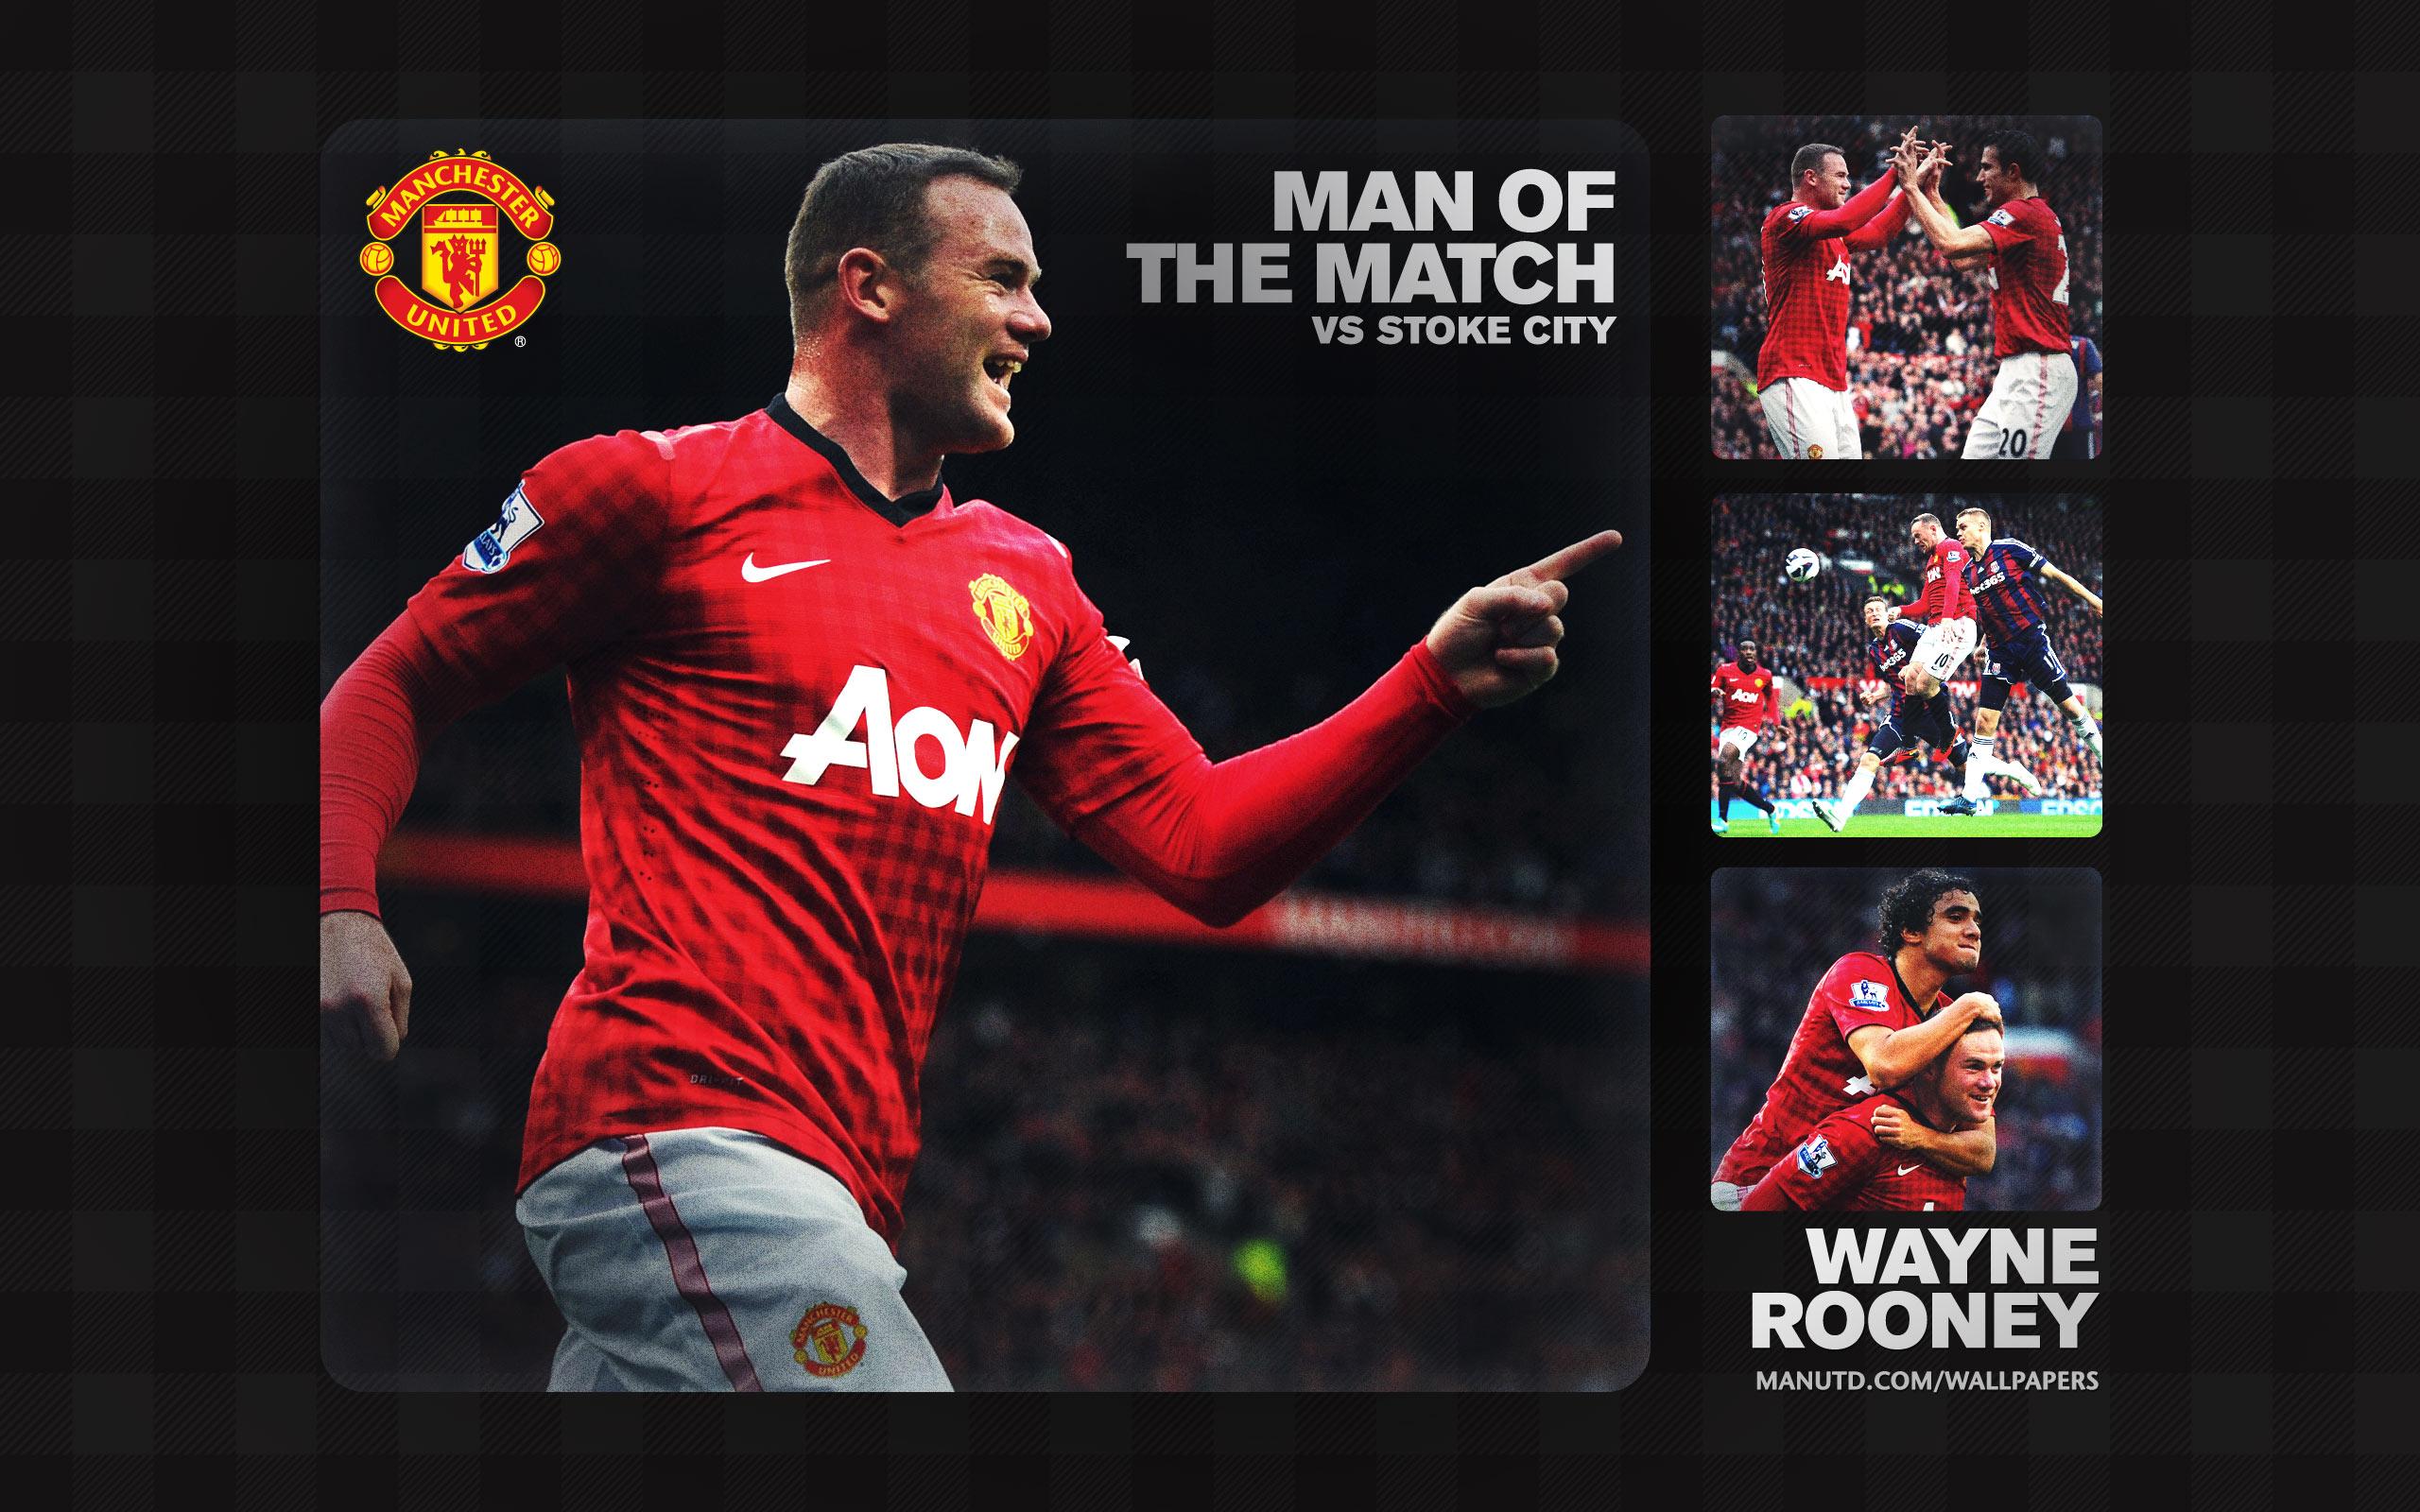 Manchester United Vs Manchester City 2012 Full Match: Manchester United Wallpaper